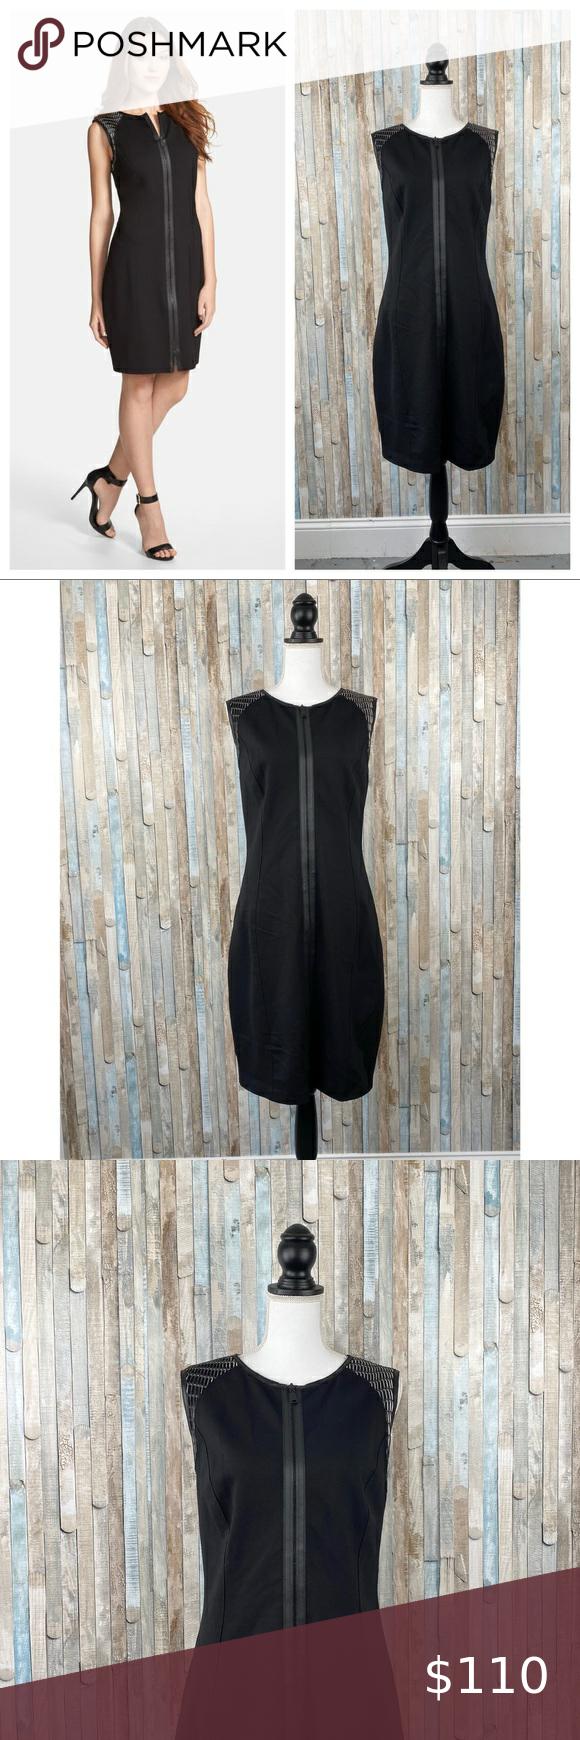 Elie Tahari 14 Black Leather Zip Lexington Dress Mixed Media Dress Elie Tahari Dresses [ 1740 x 580 Pixel ]